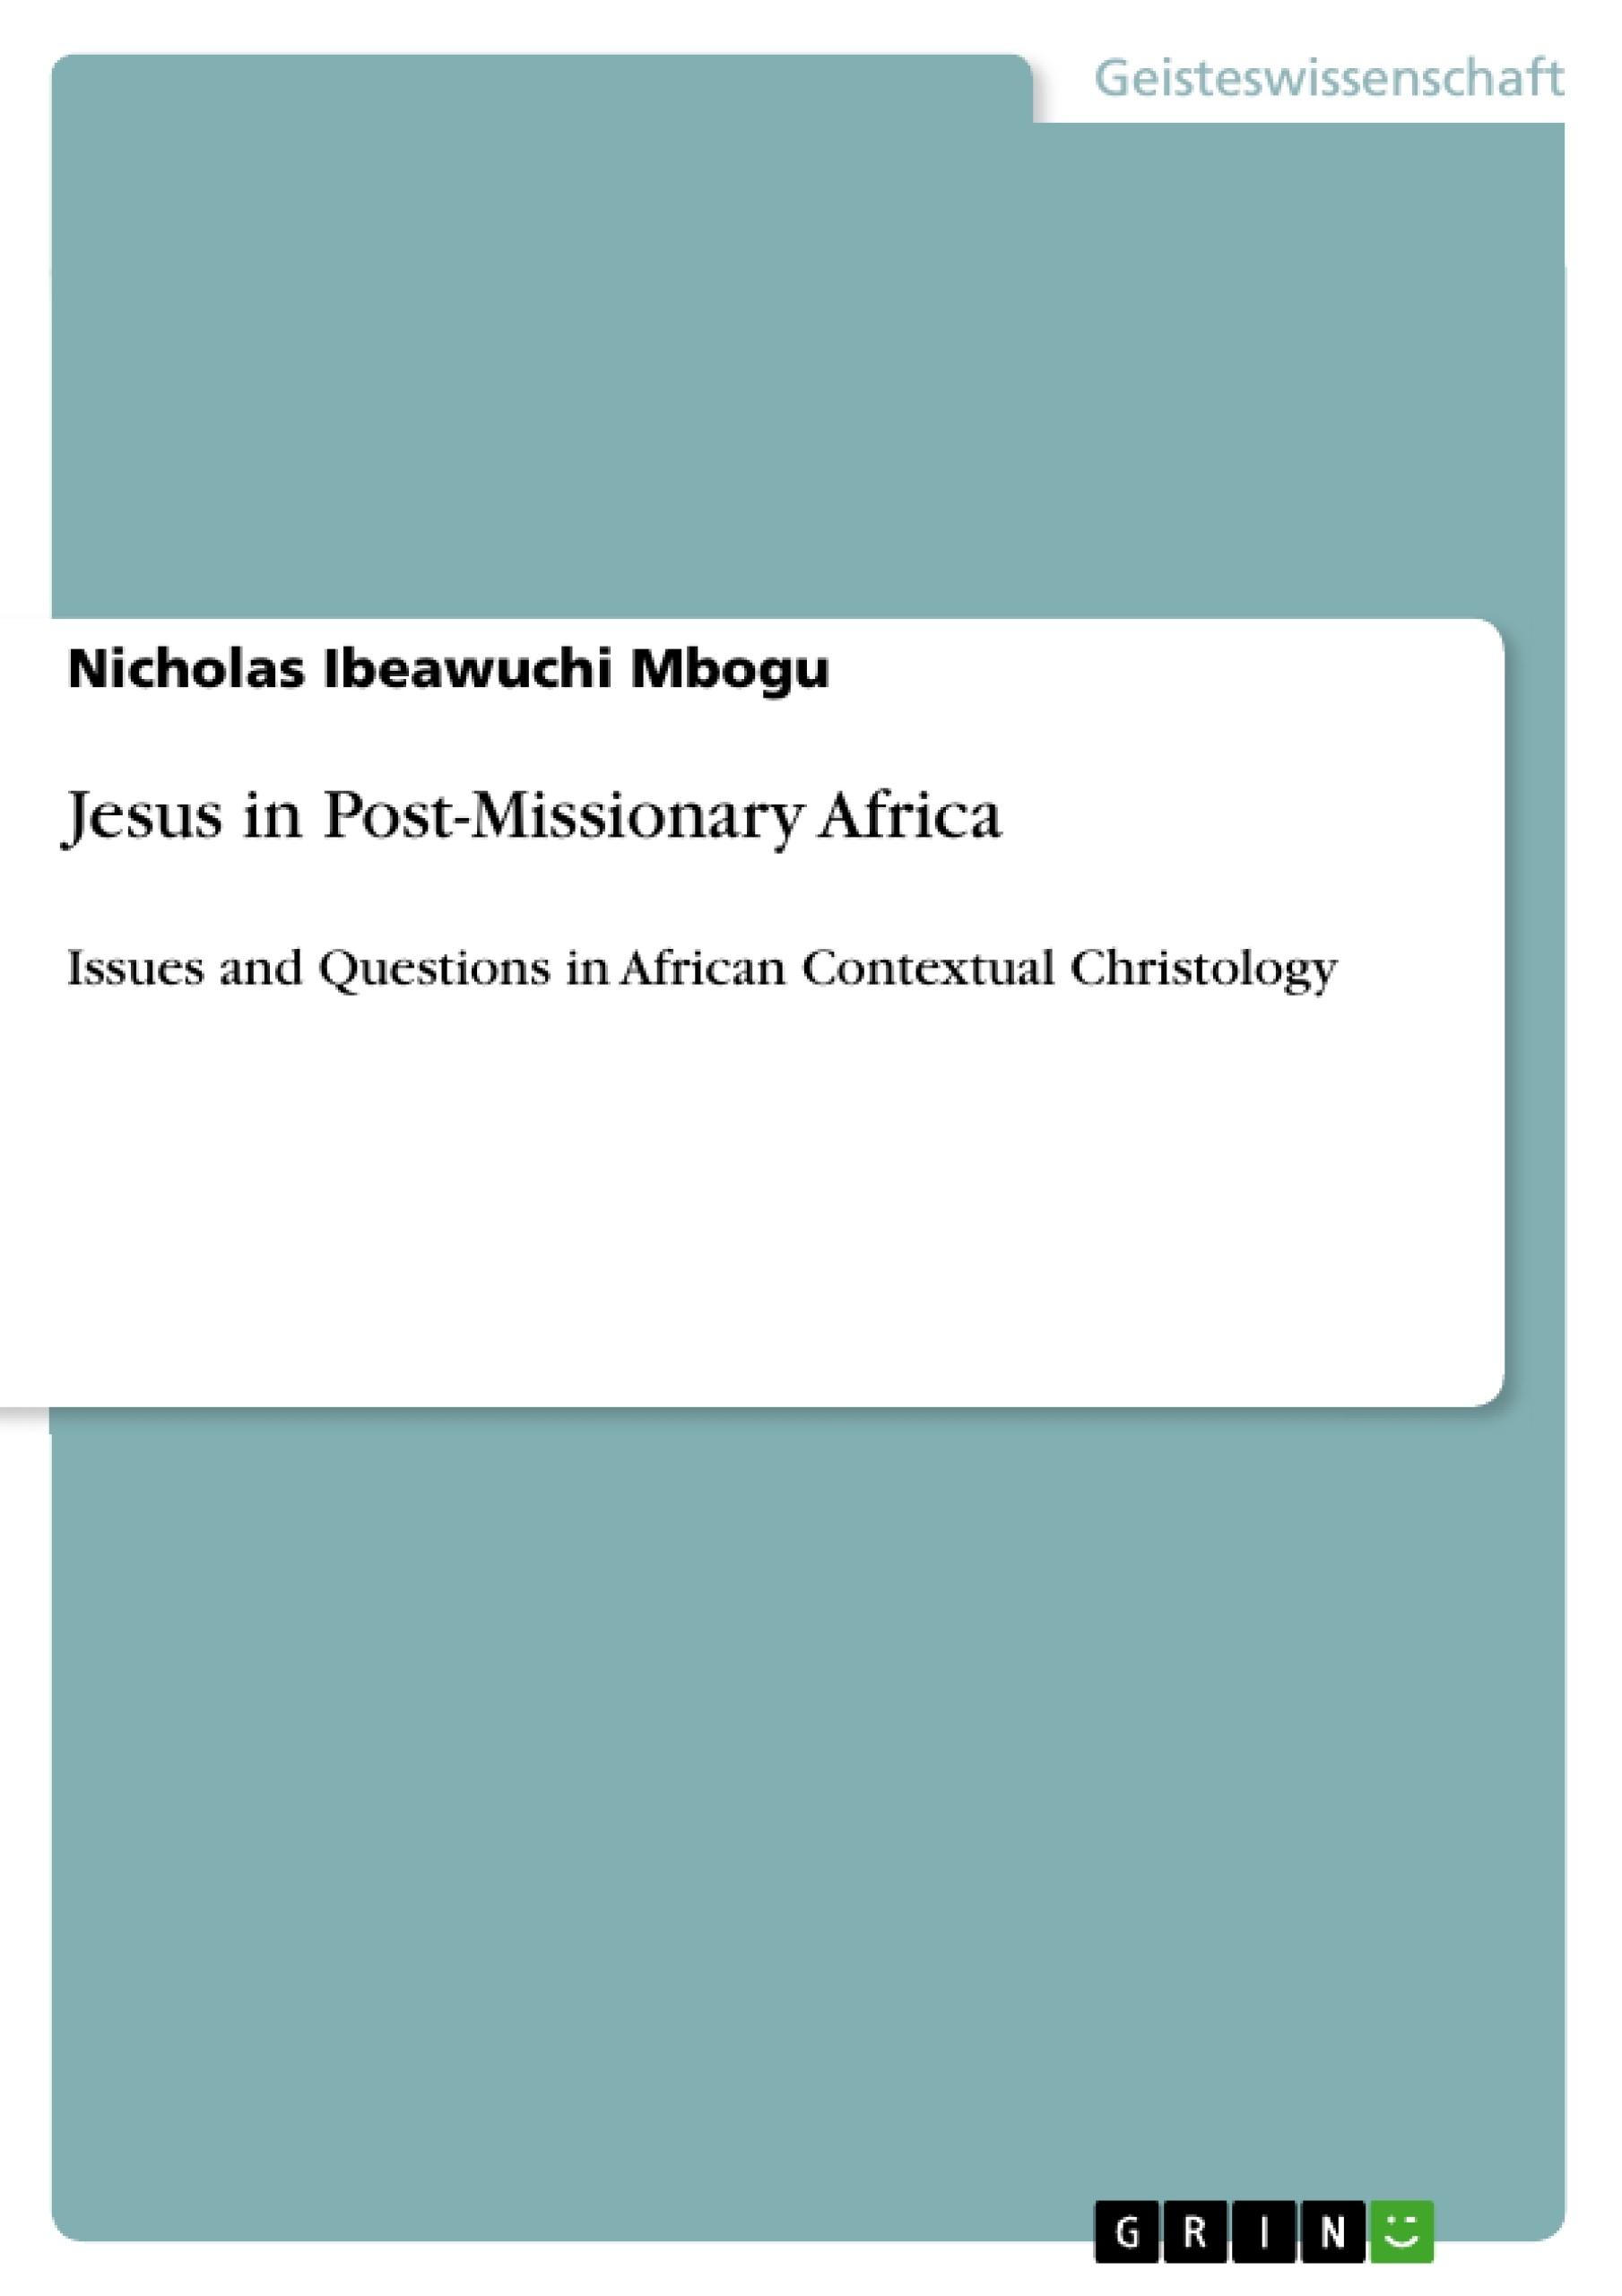 Titel: Jesus in Post-Missionary Africa